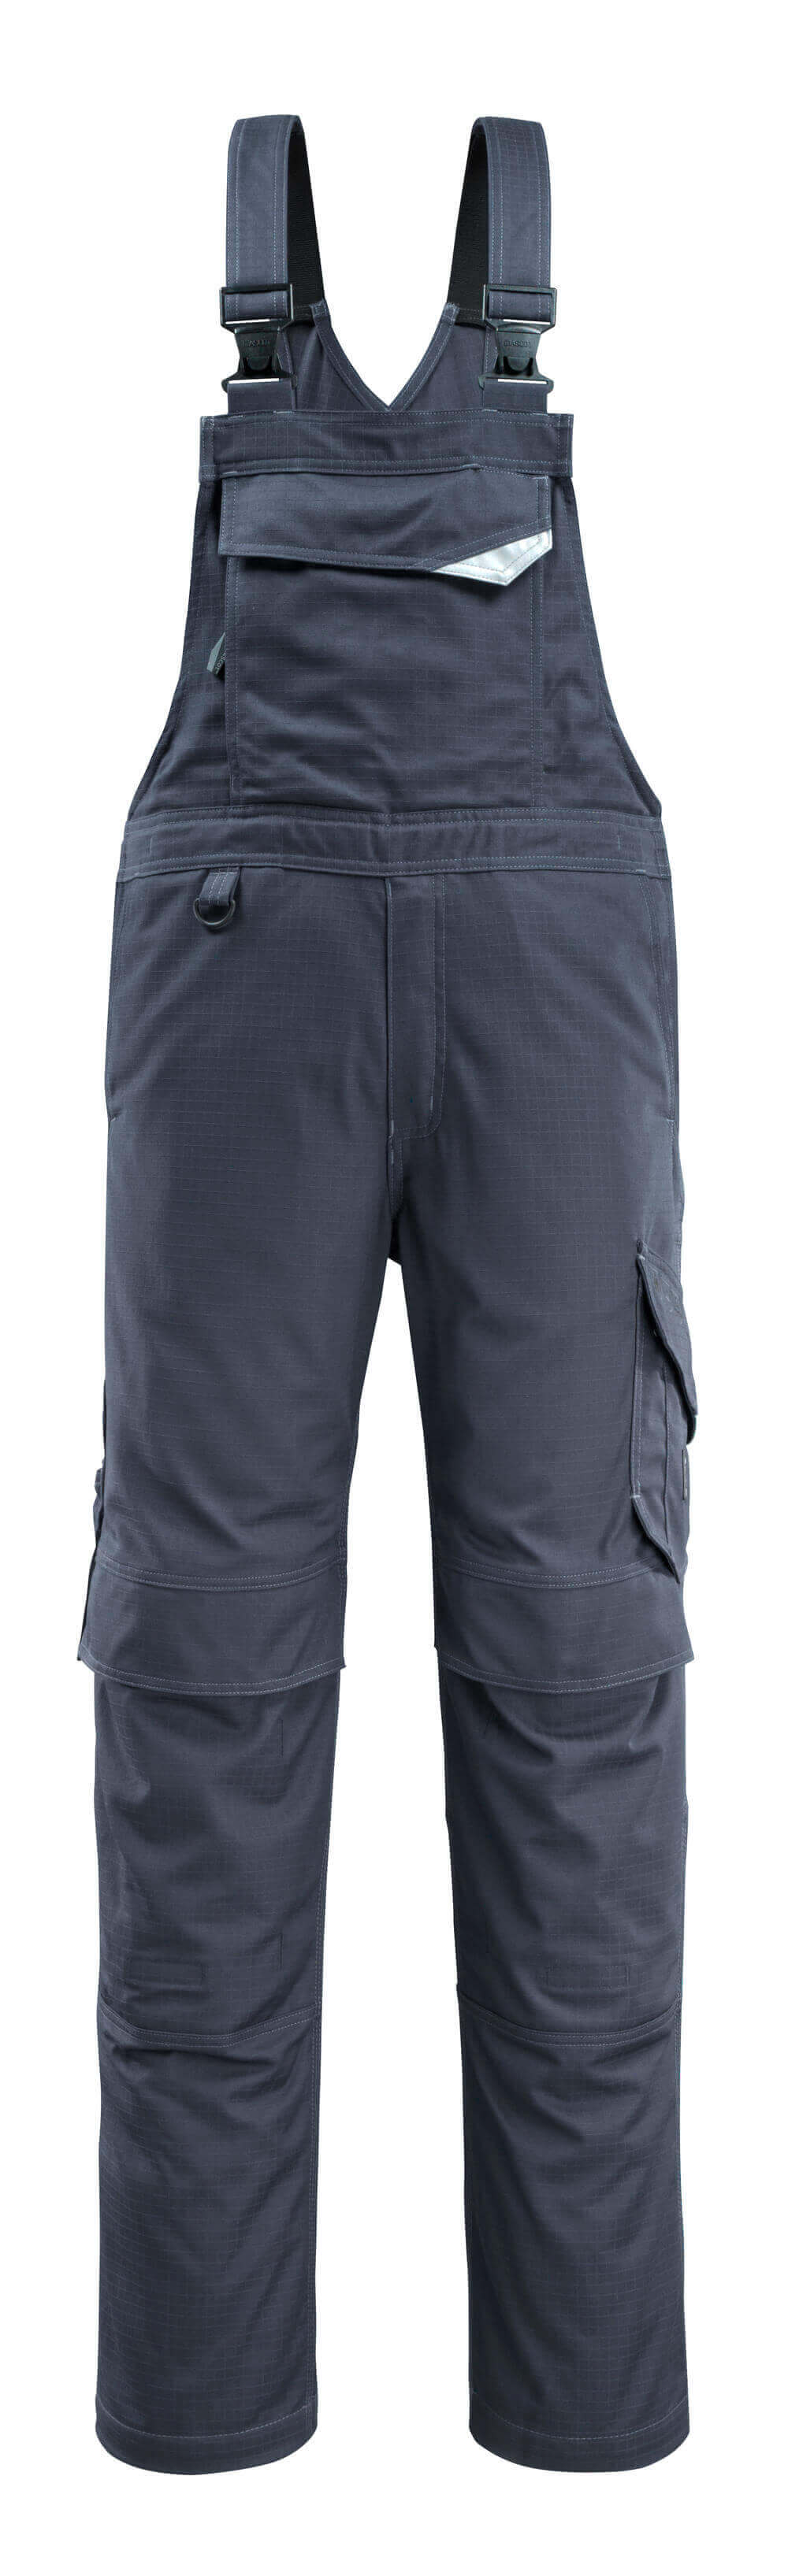 13669-216-010 Bib & Brace with kneepad pockets - dark navy